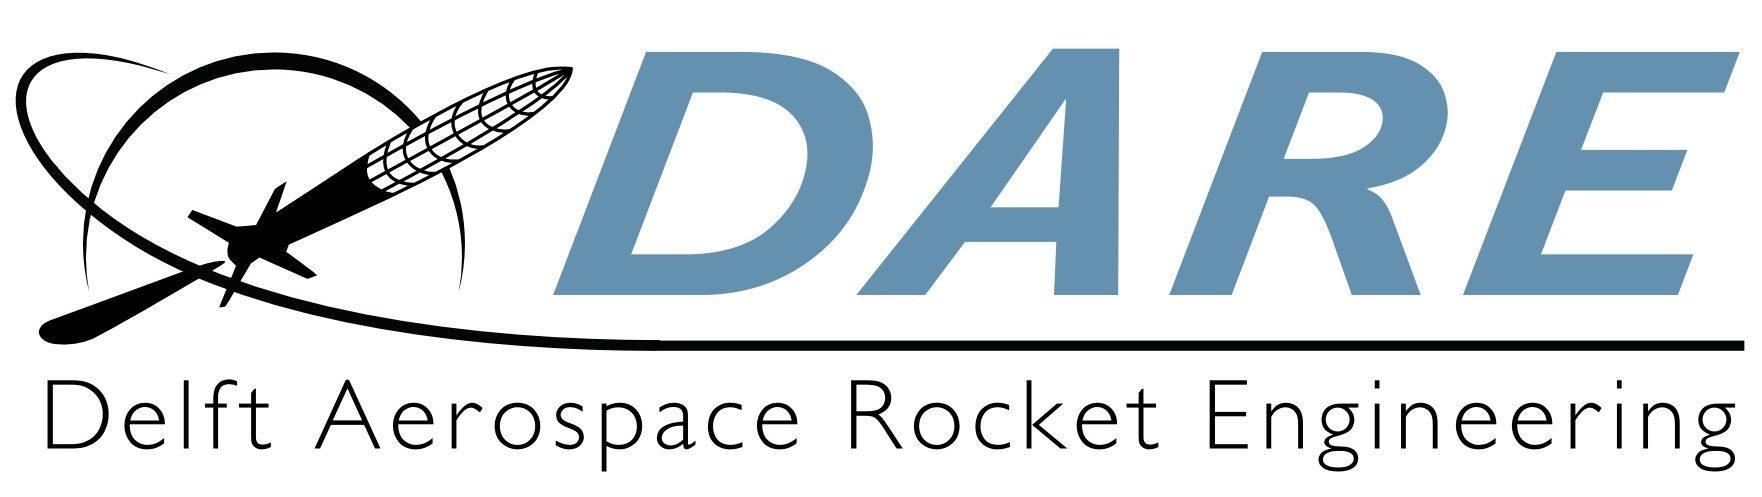 DARE logo_full-1